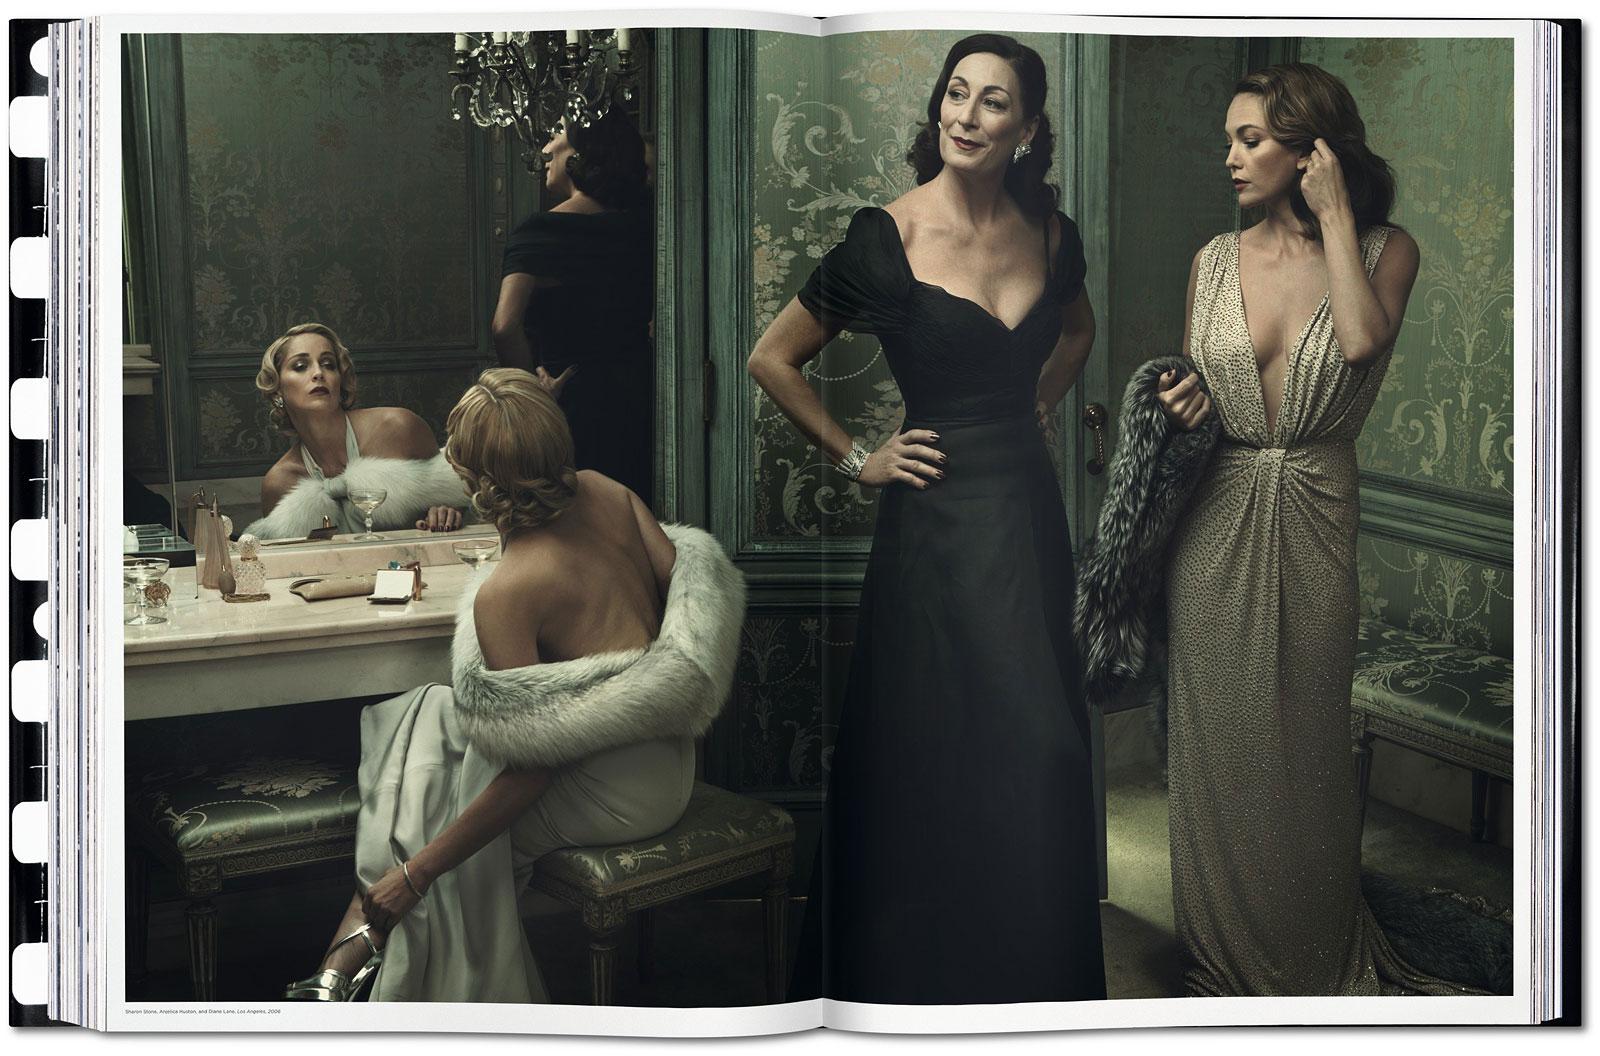 foto: © Annie Leibovitz - TASCHEN - Sharon Stone, Anjelica Huston, Diane Lane